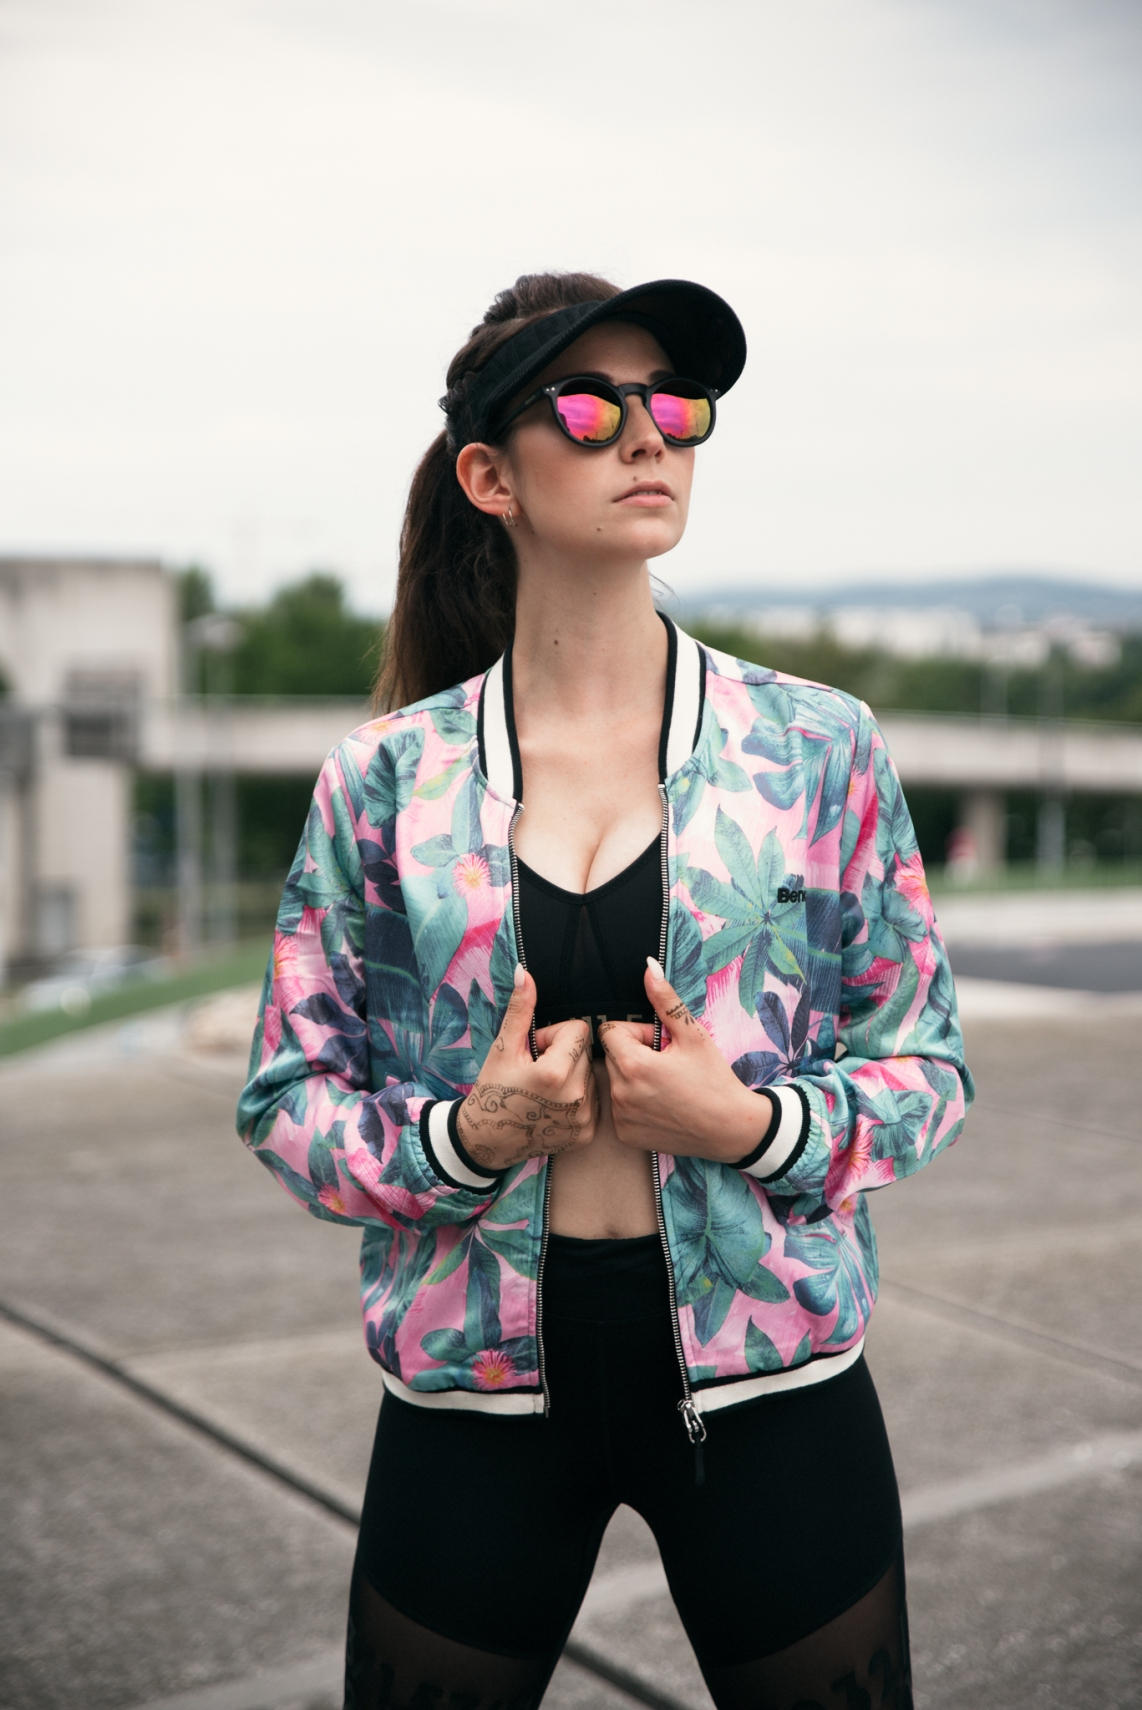 martin-phox-fashion-photography-vienna-leovictory-5